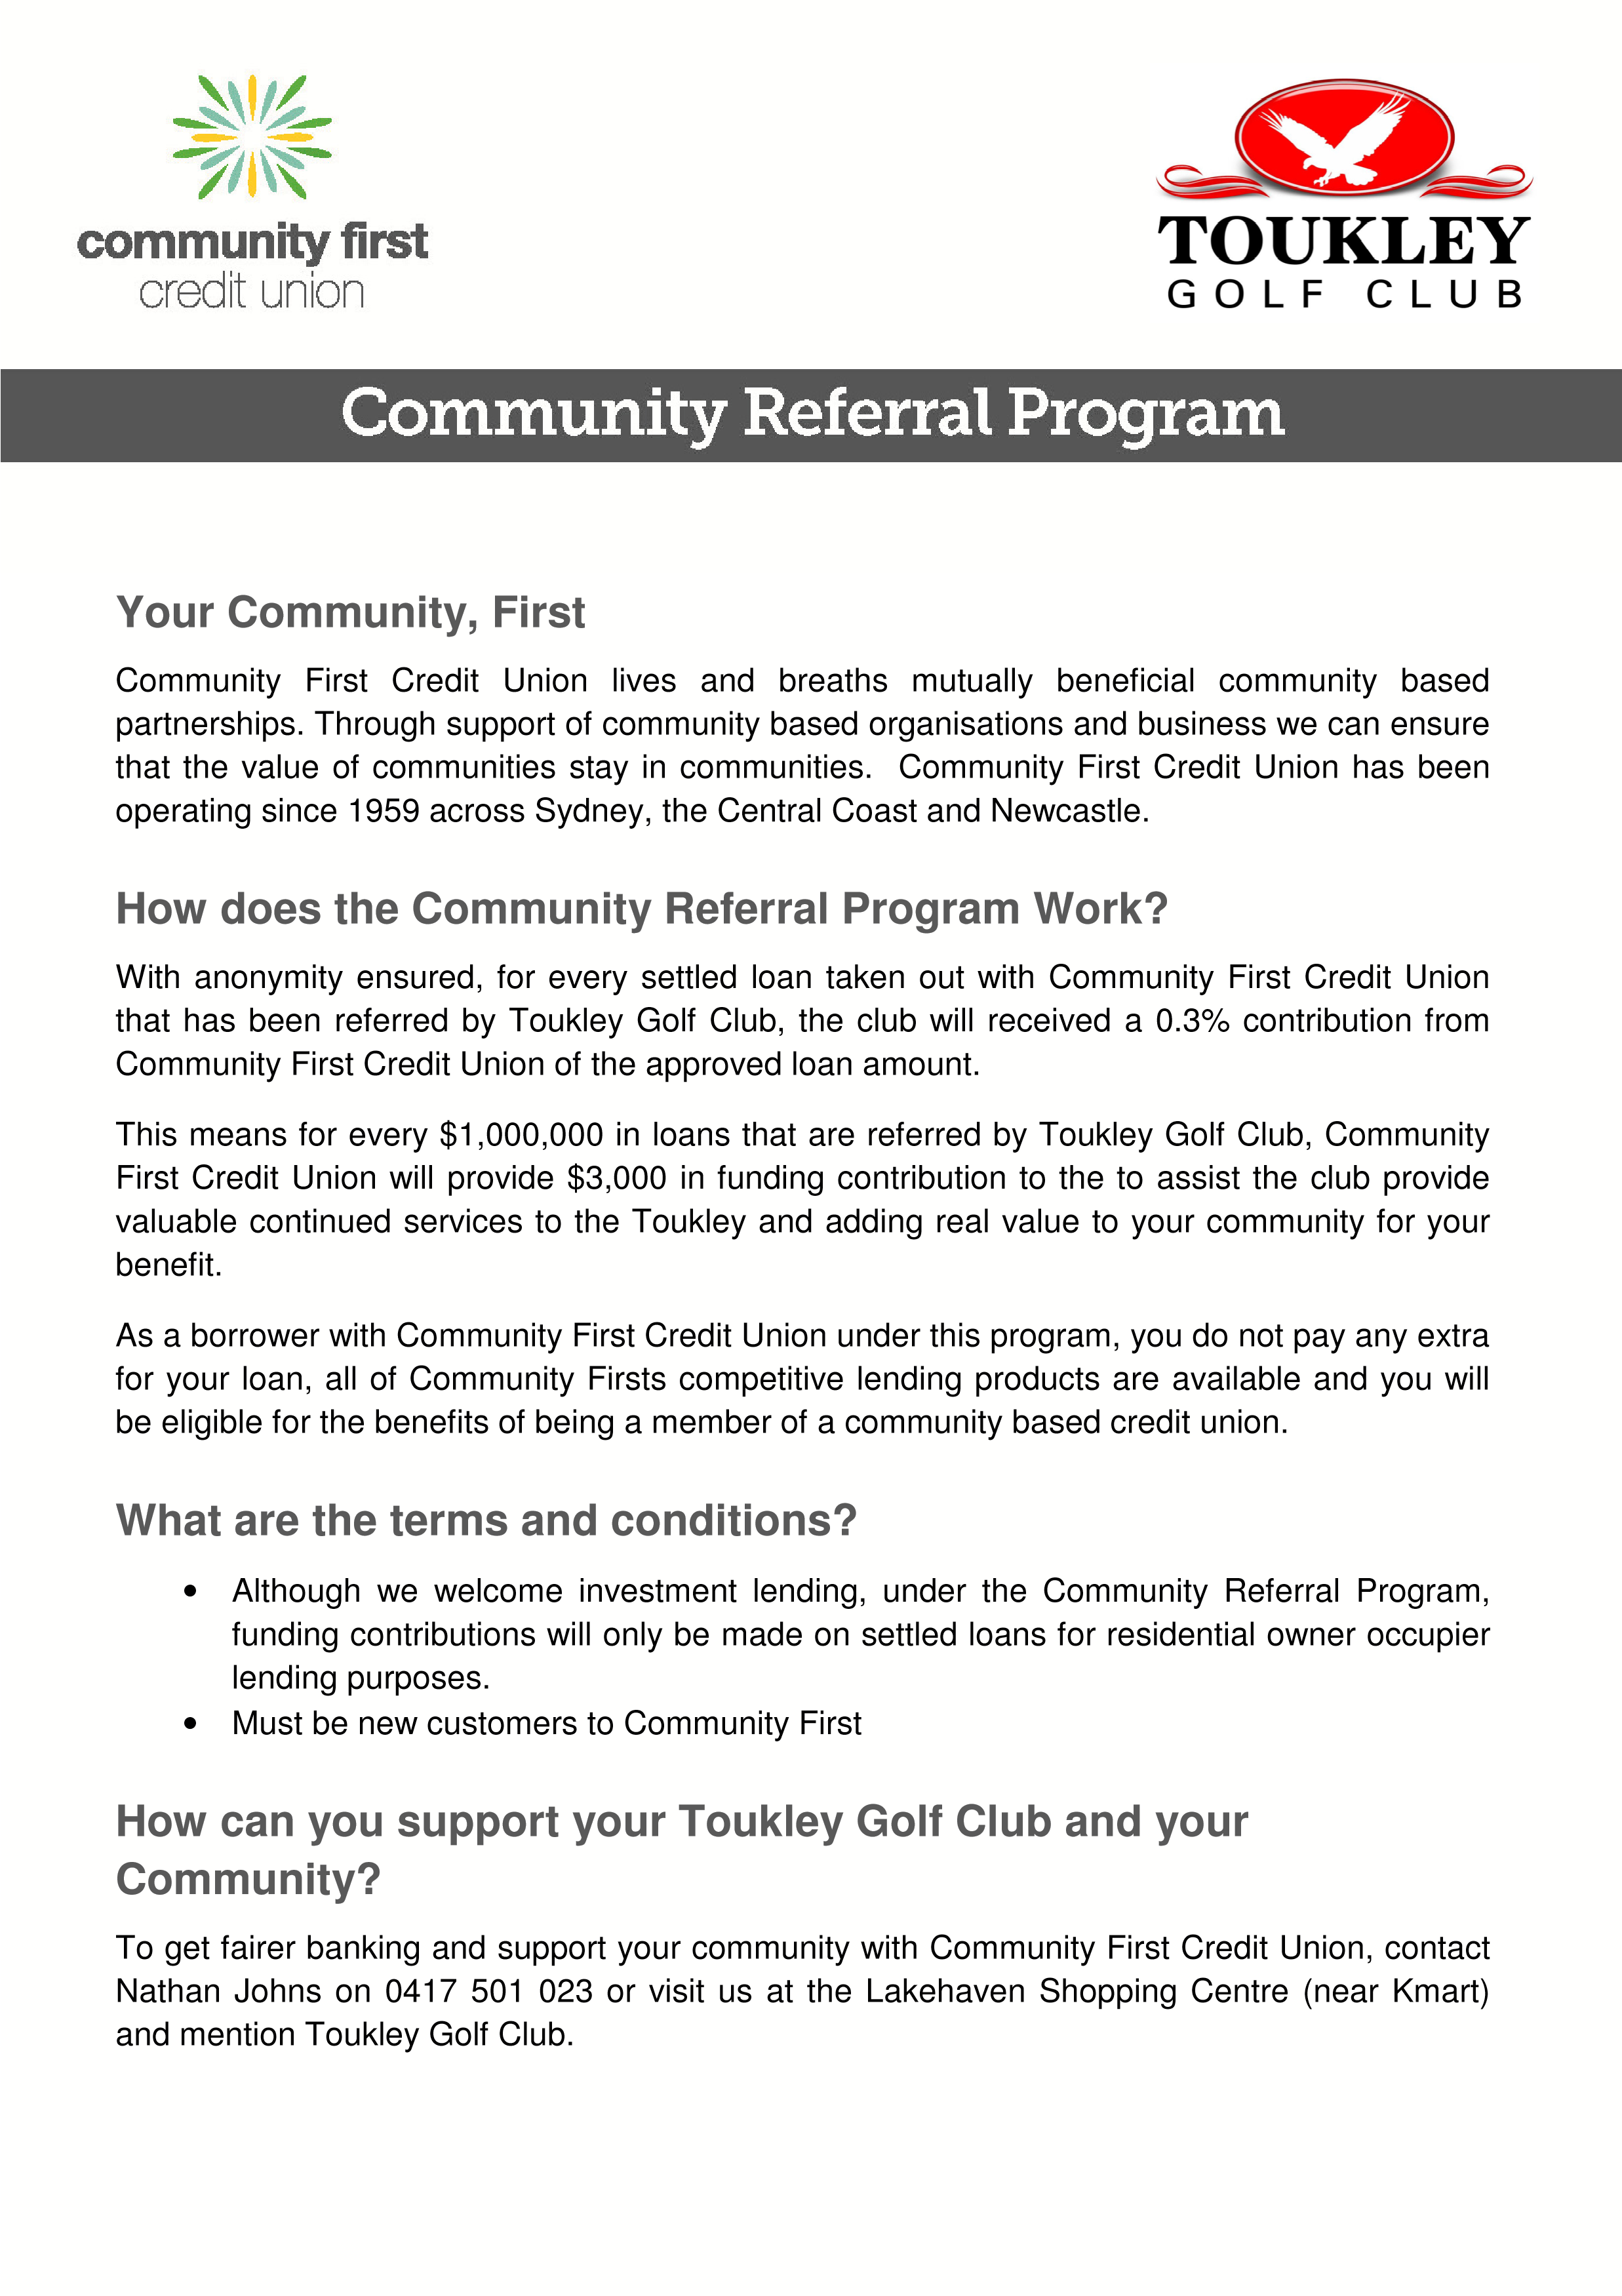 Community First Credit Union - Referral Program - Toukley Golf Club